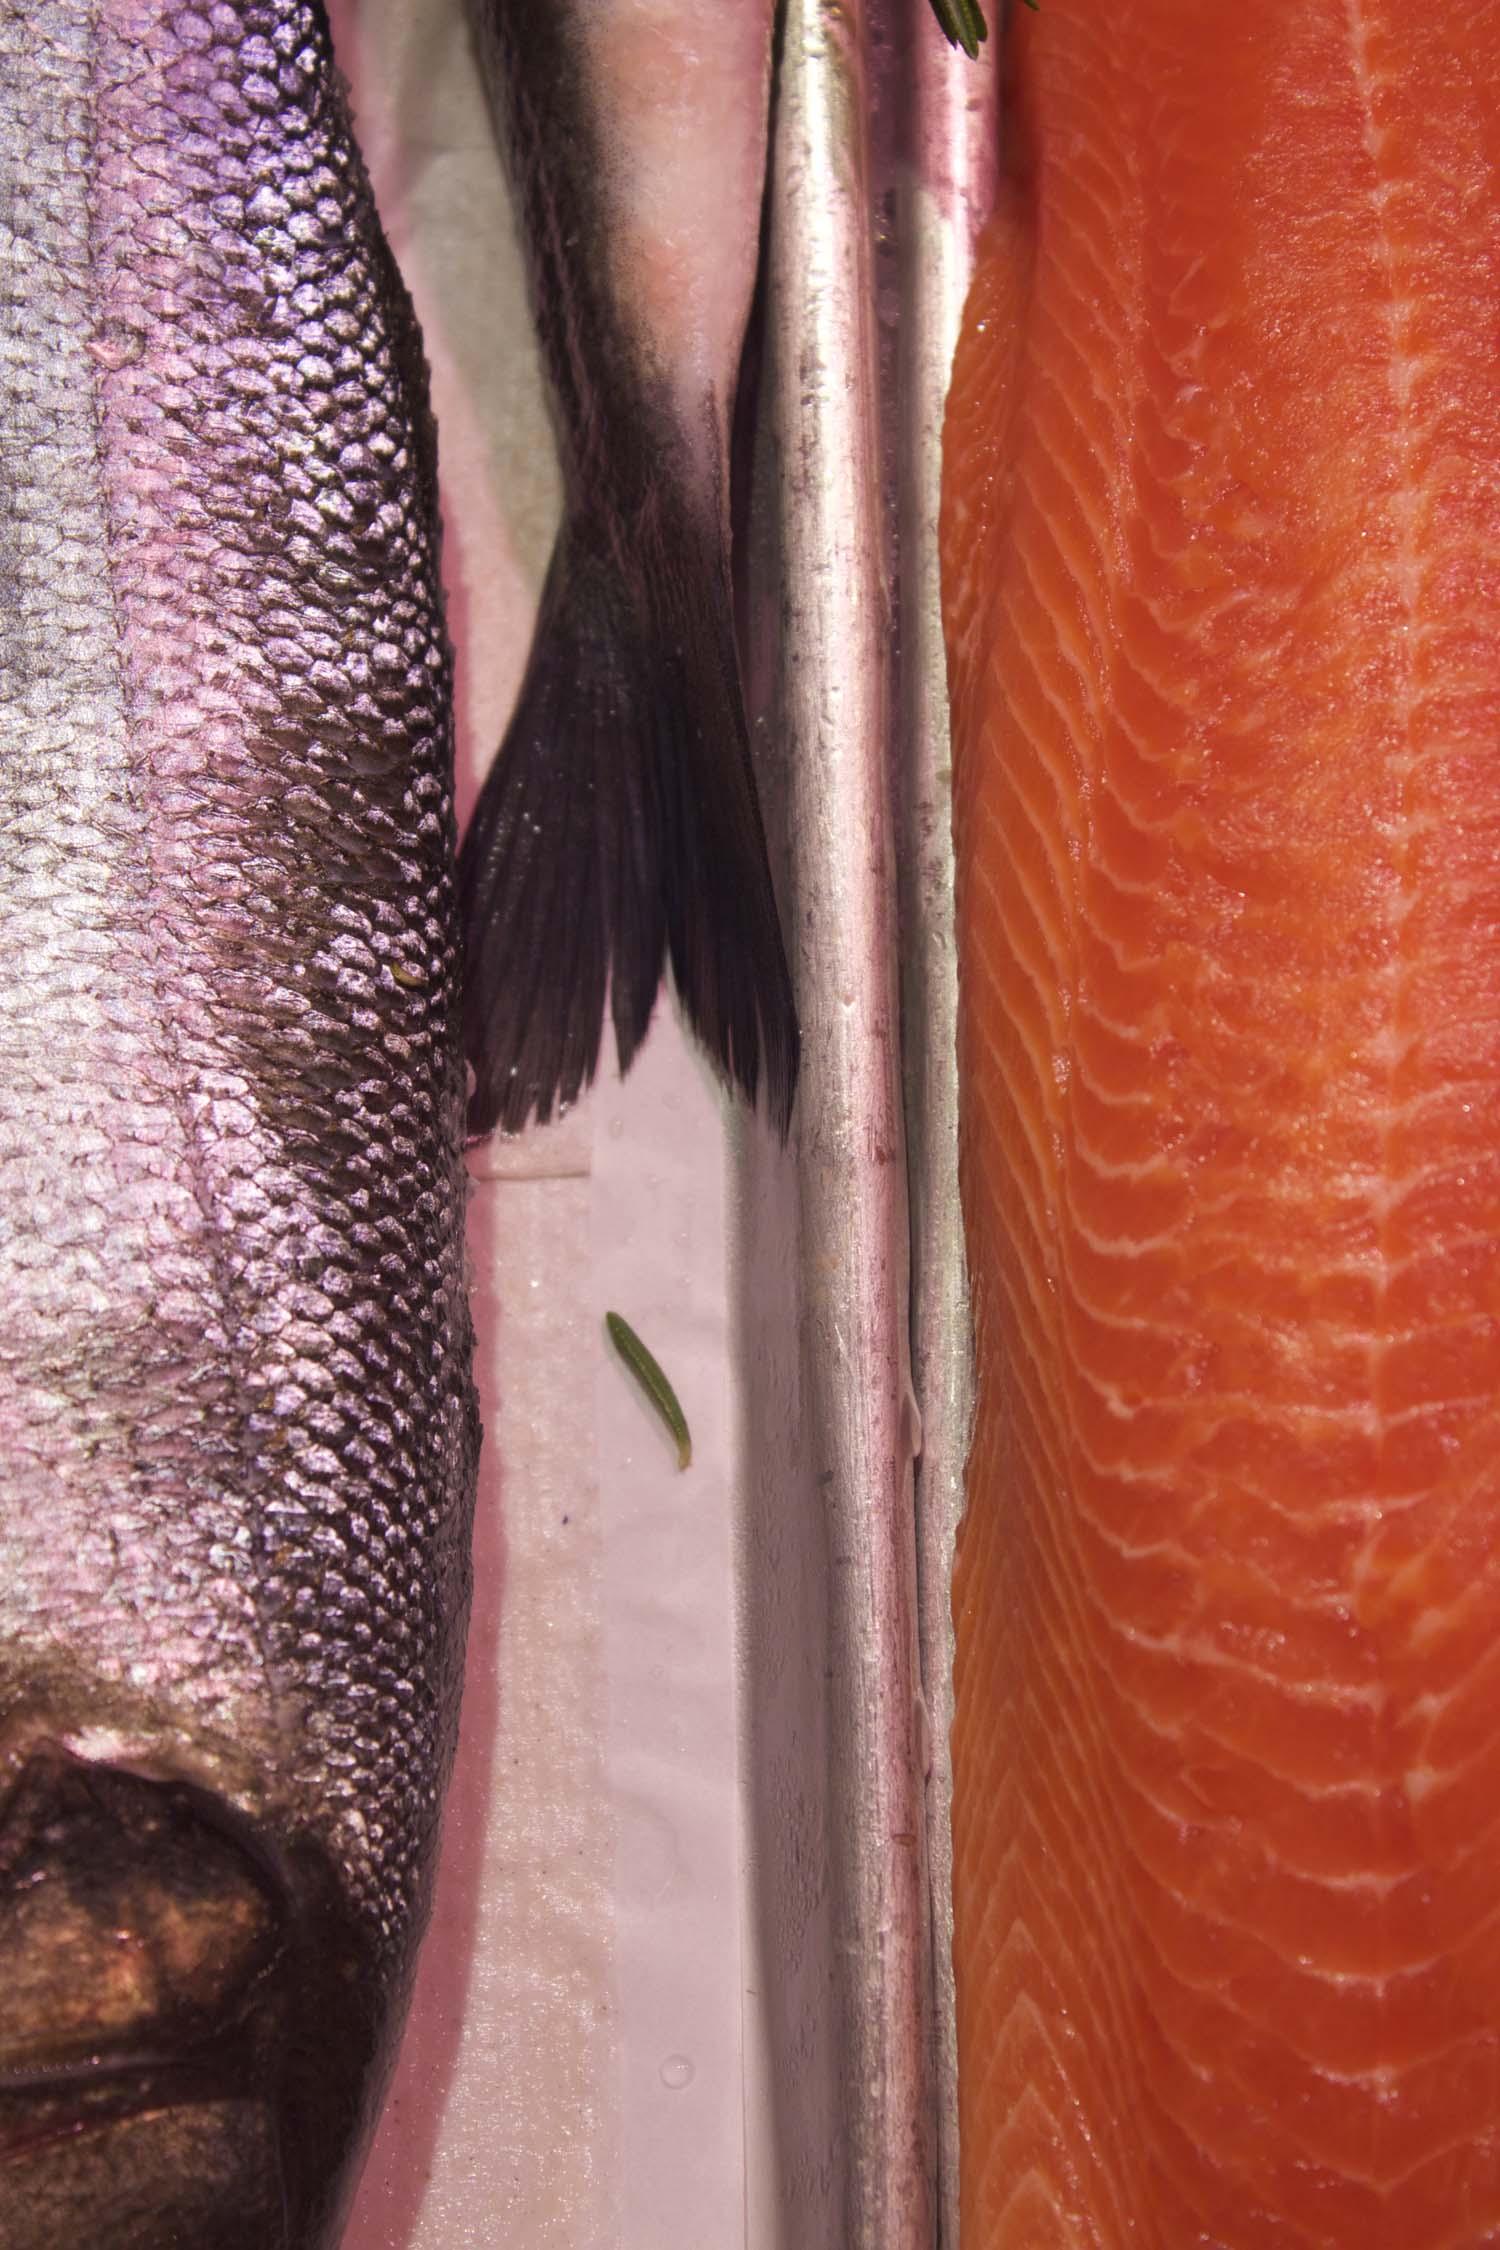 Fish | Image: Laura Messermith